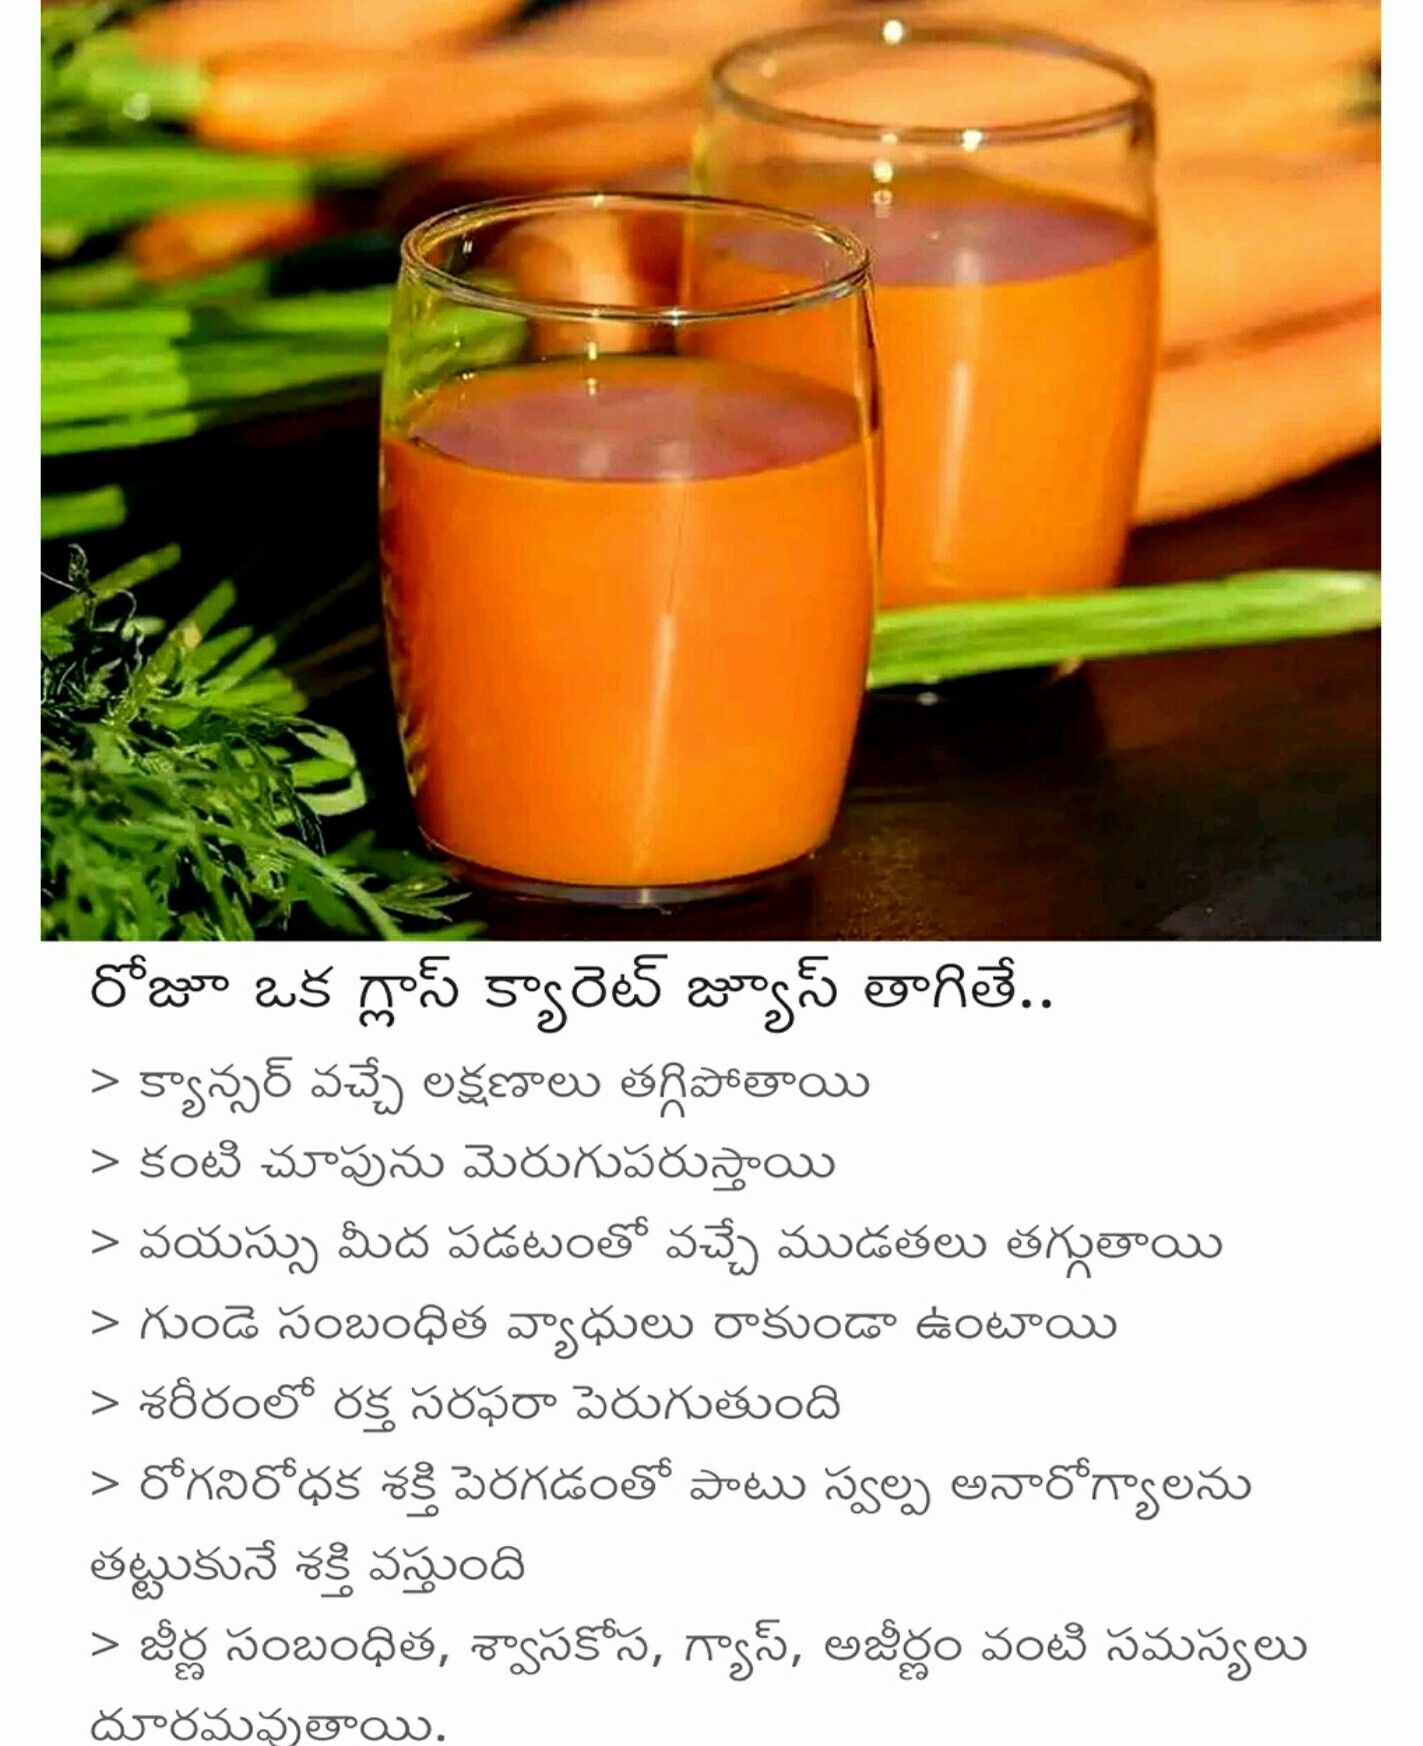 Pin by Vasu, Chittoor on Telugu, Vasu, Chittoor Health